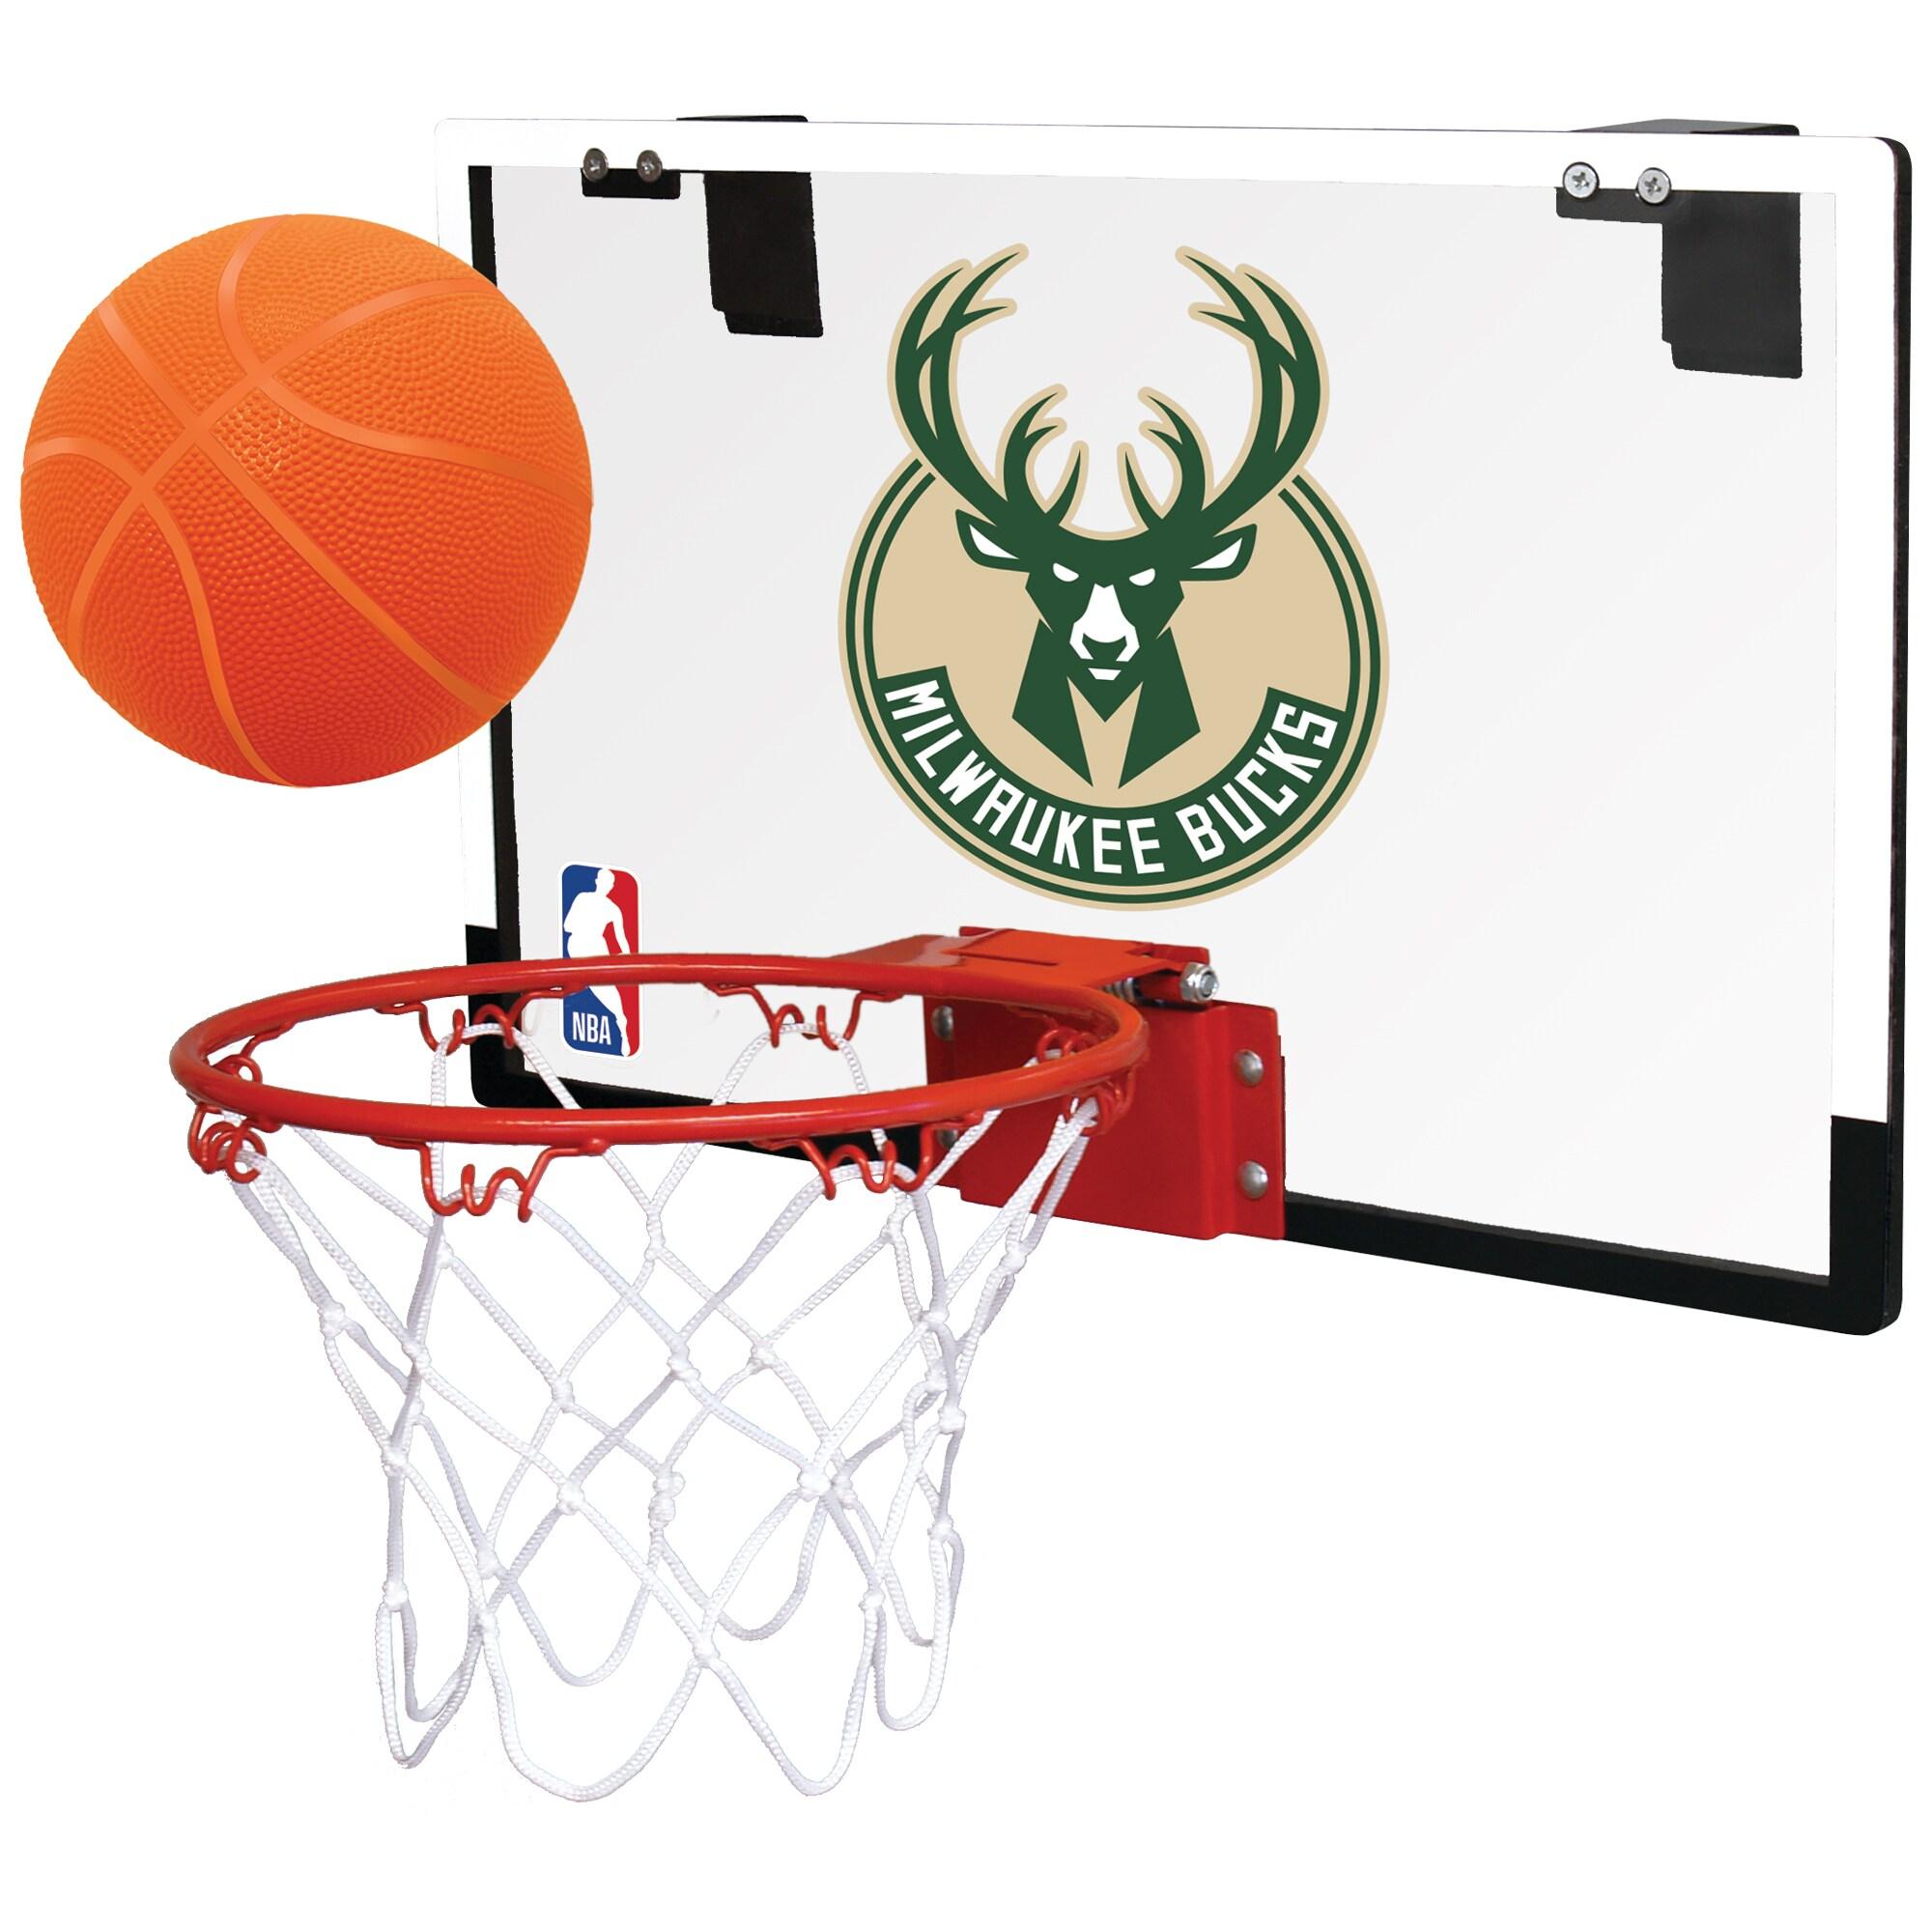 Milwaukee Bucks Rawlings NBA Polycarbonate Hoop Set